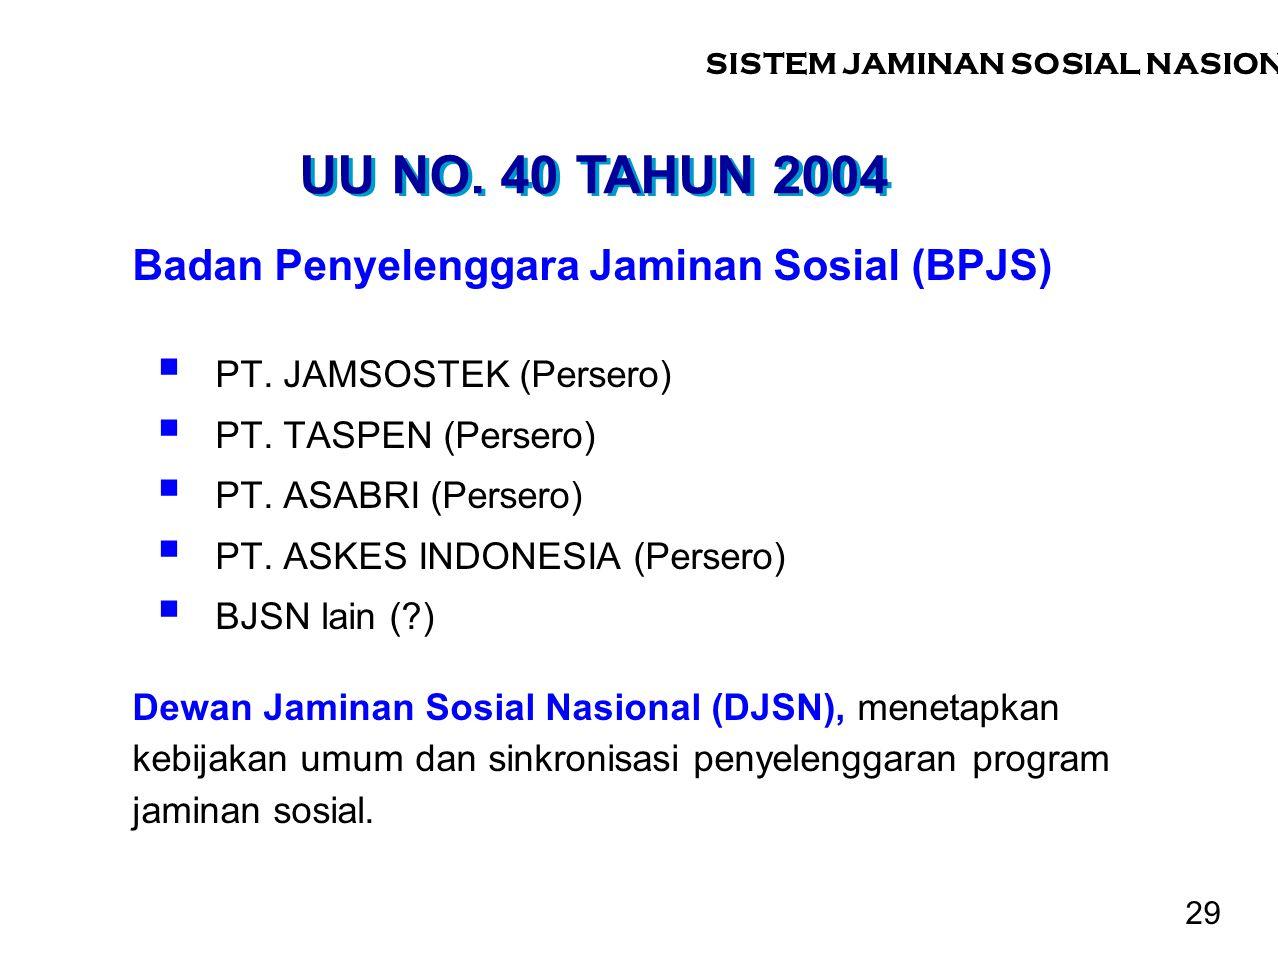 UU NO. 40 TAHUN 2004 Badan Penyelenggara Jaminan Sosial (BPJS)  PT. JAMSOSTEK (Persero)  PT. TASPEN (Persero)  PT. ASABRI (Persero)  PT. ASKES IND